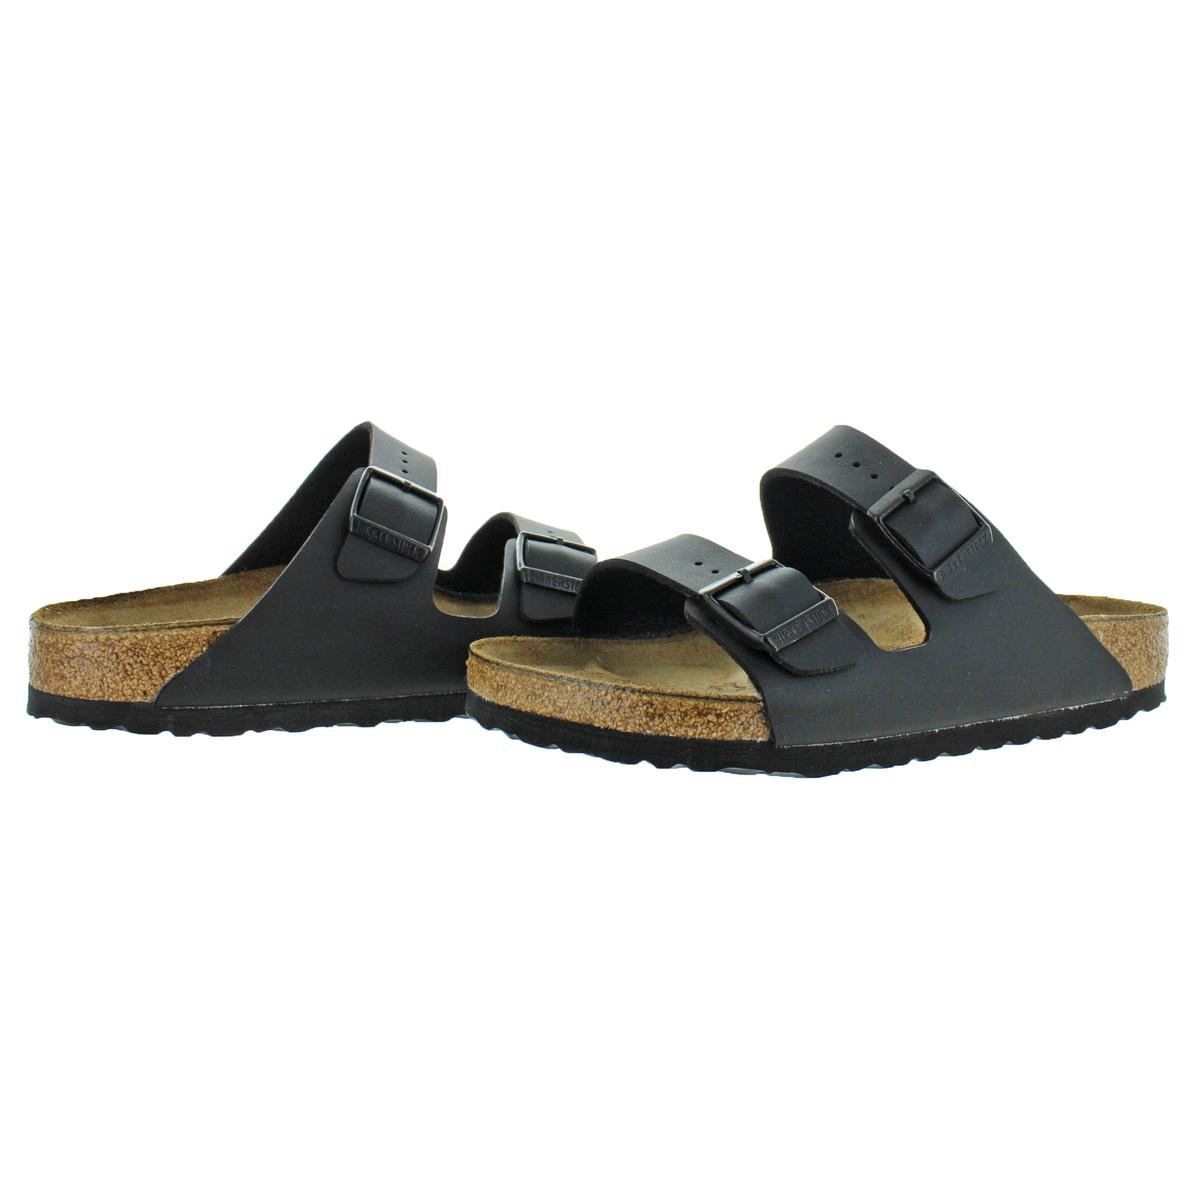 Birkenstock-Women-039-s-Arizona-Double-Buckle-Cork-Sandals thumbnail 3